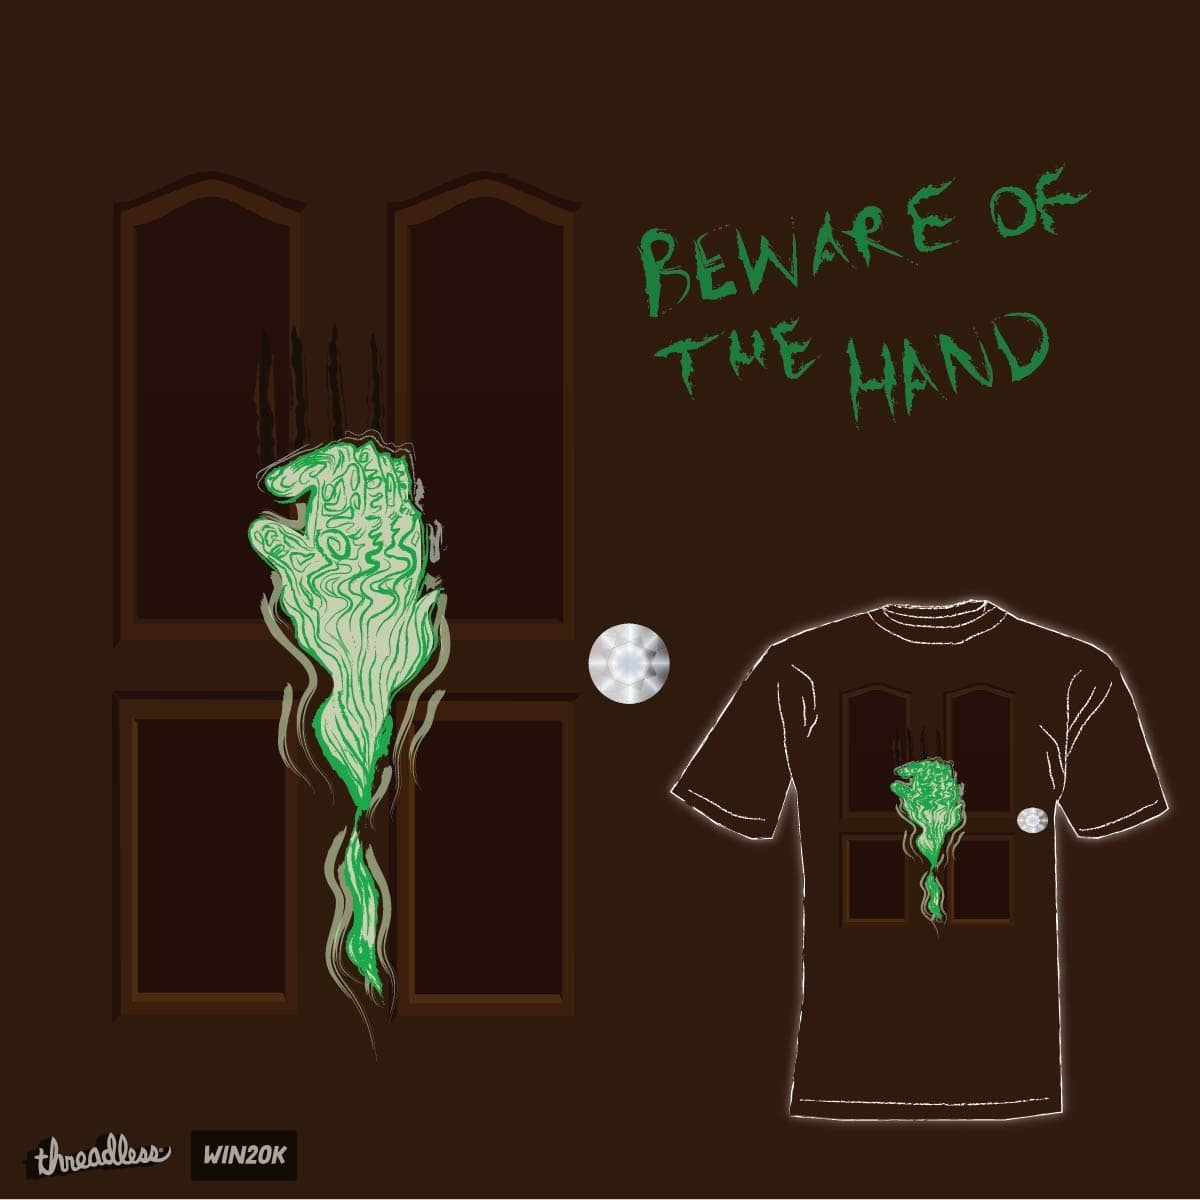 Beware of the hand by brett.hackett.5 on Threadless